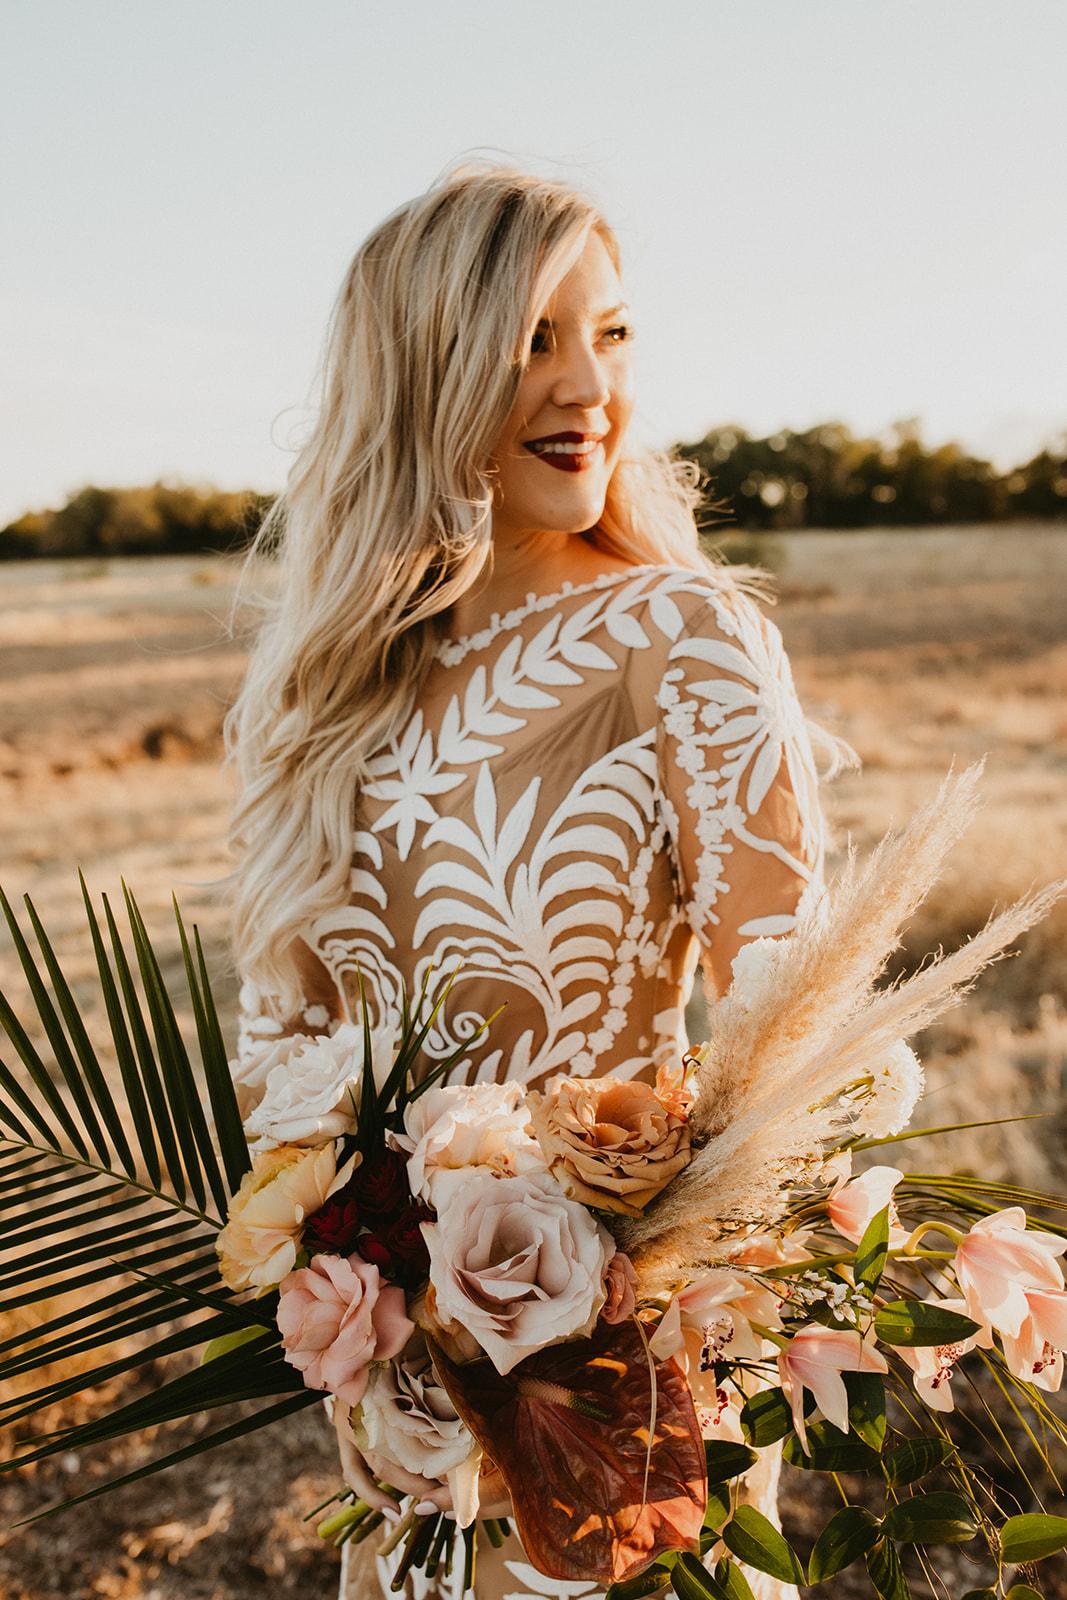 A Palm Spring Inspired Wedding - Featuring:Photography: Century TreePlanning: Epoch Co EventsVenue: Prospect HouseRentals: Vestige Event RentalsHAMU: Lola BeautyDress: Rue De Seine